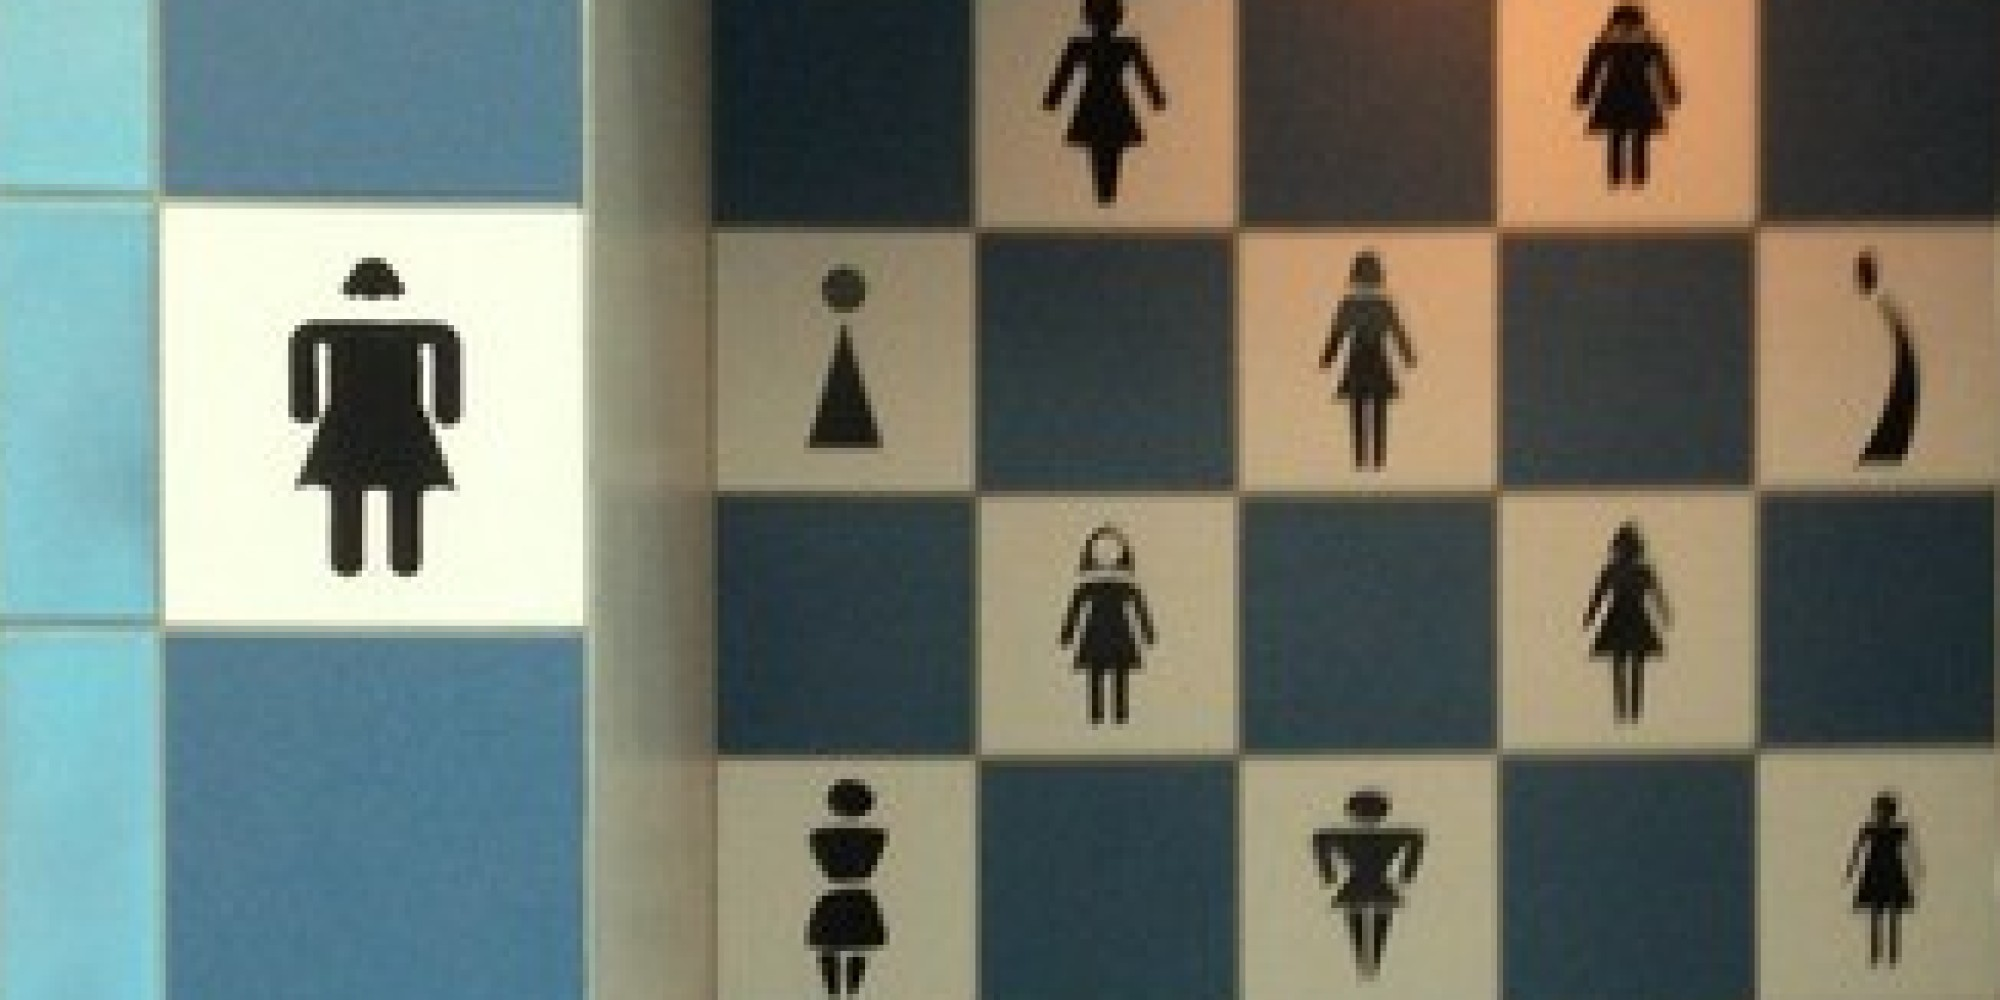 Bathroom sign at jacksonville international airport makes for Women s bathroom sign